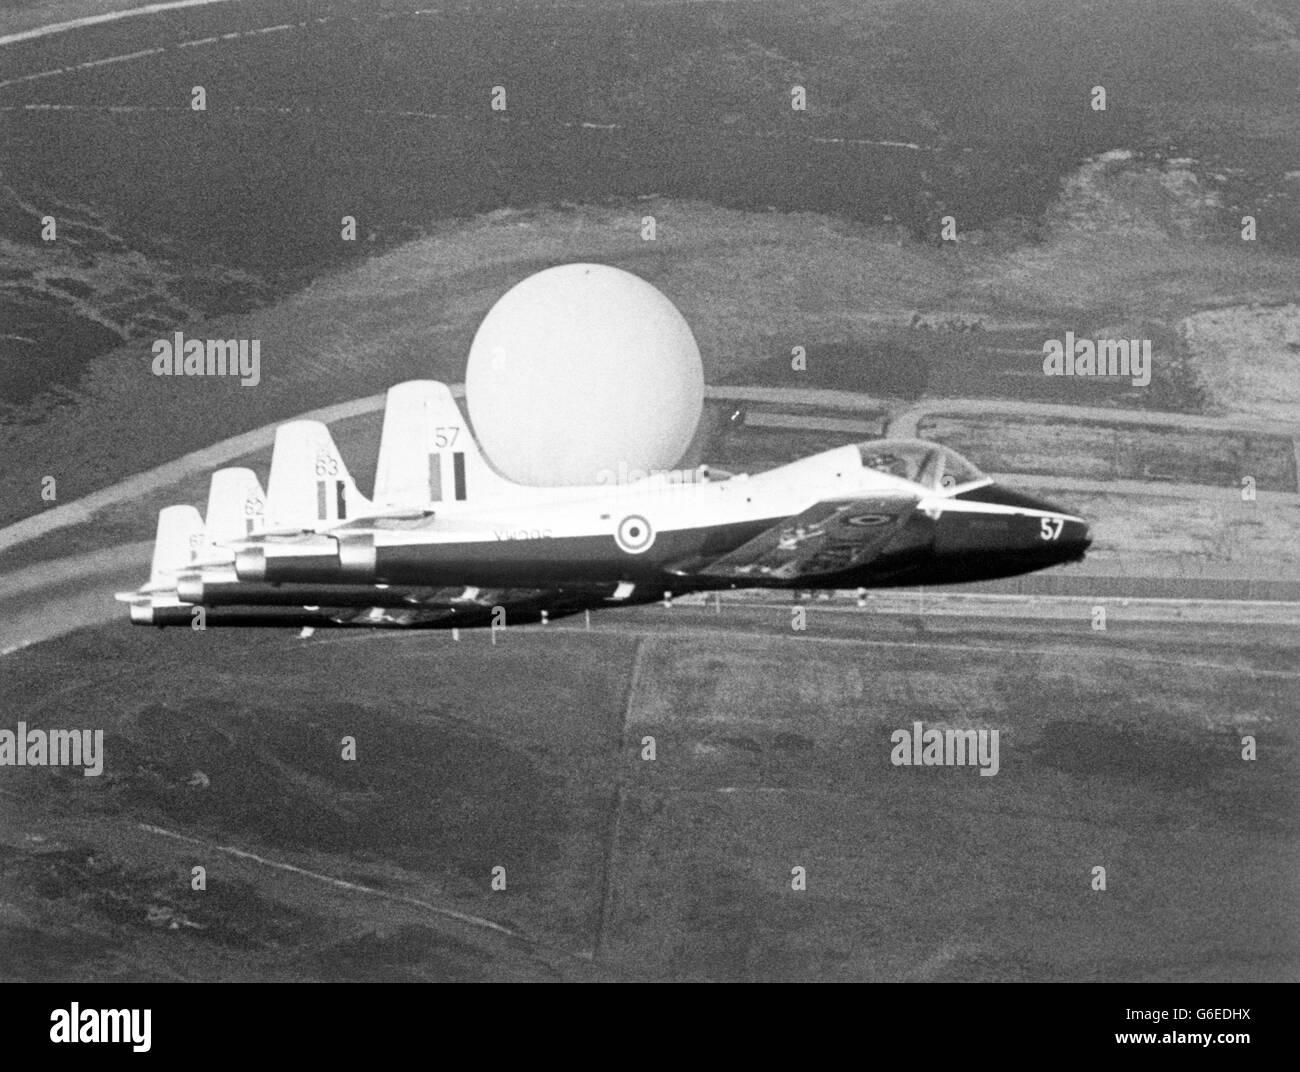 RAF Fylingdales - North York Moors - Stock Image